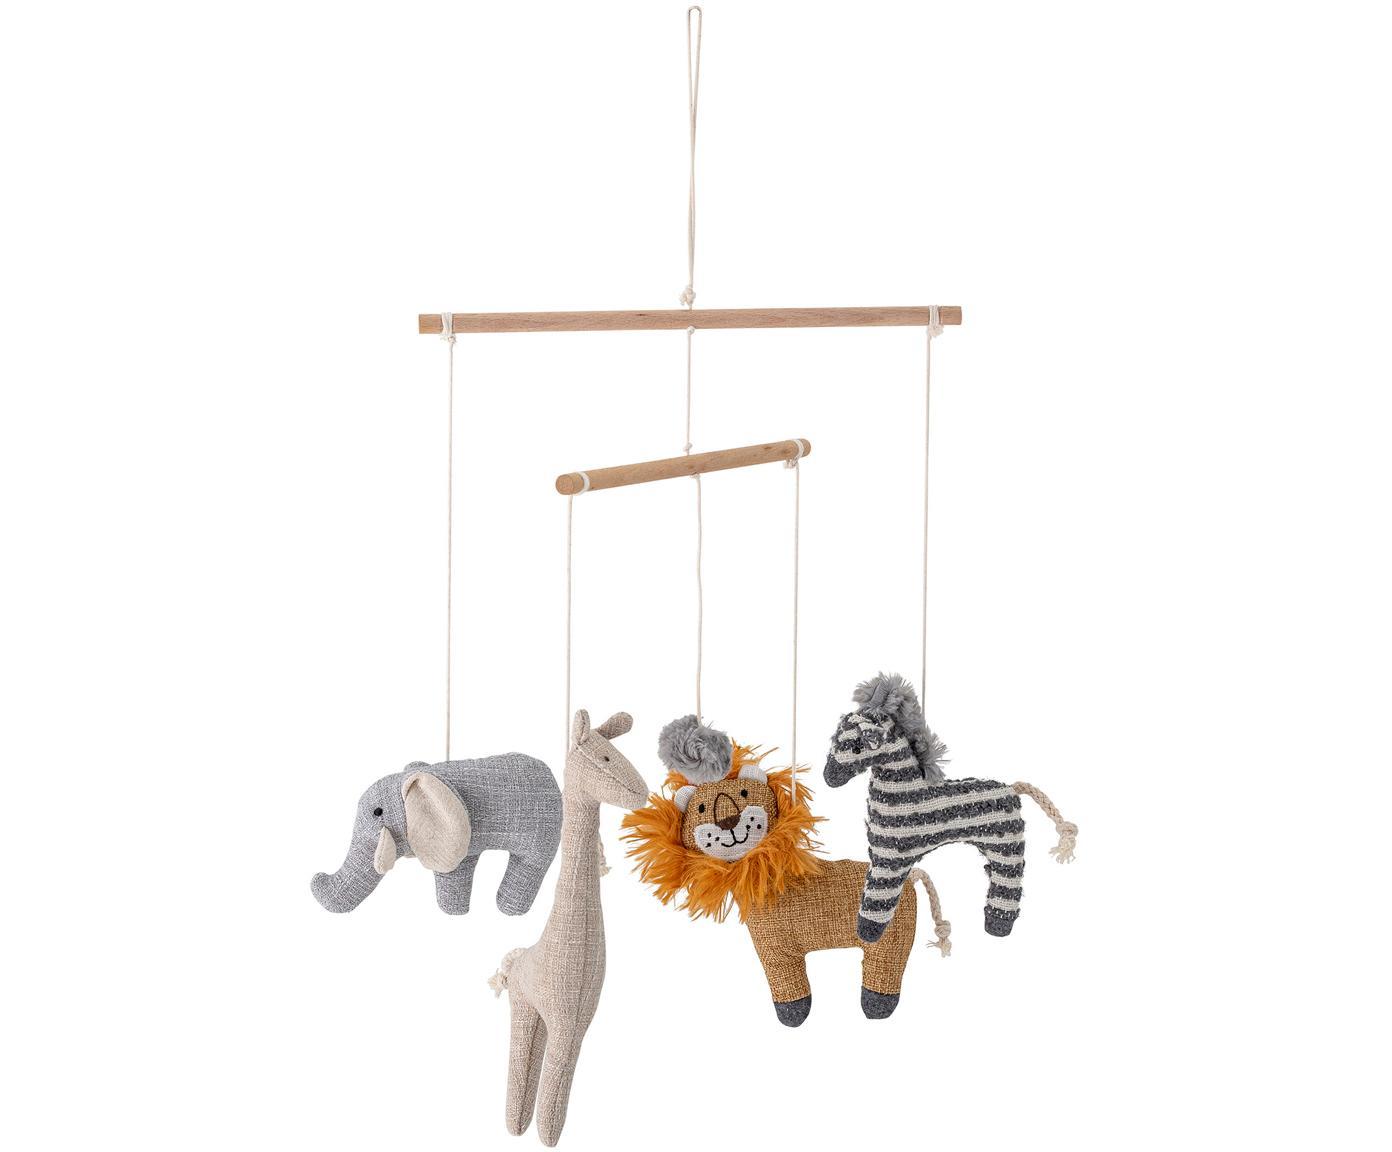 Babymobile Animals, Polyester, Leinen, Birkenholz, Mehrfarbig, Ø 26 x H 31 cm